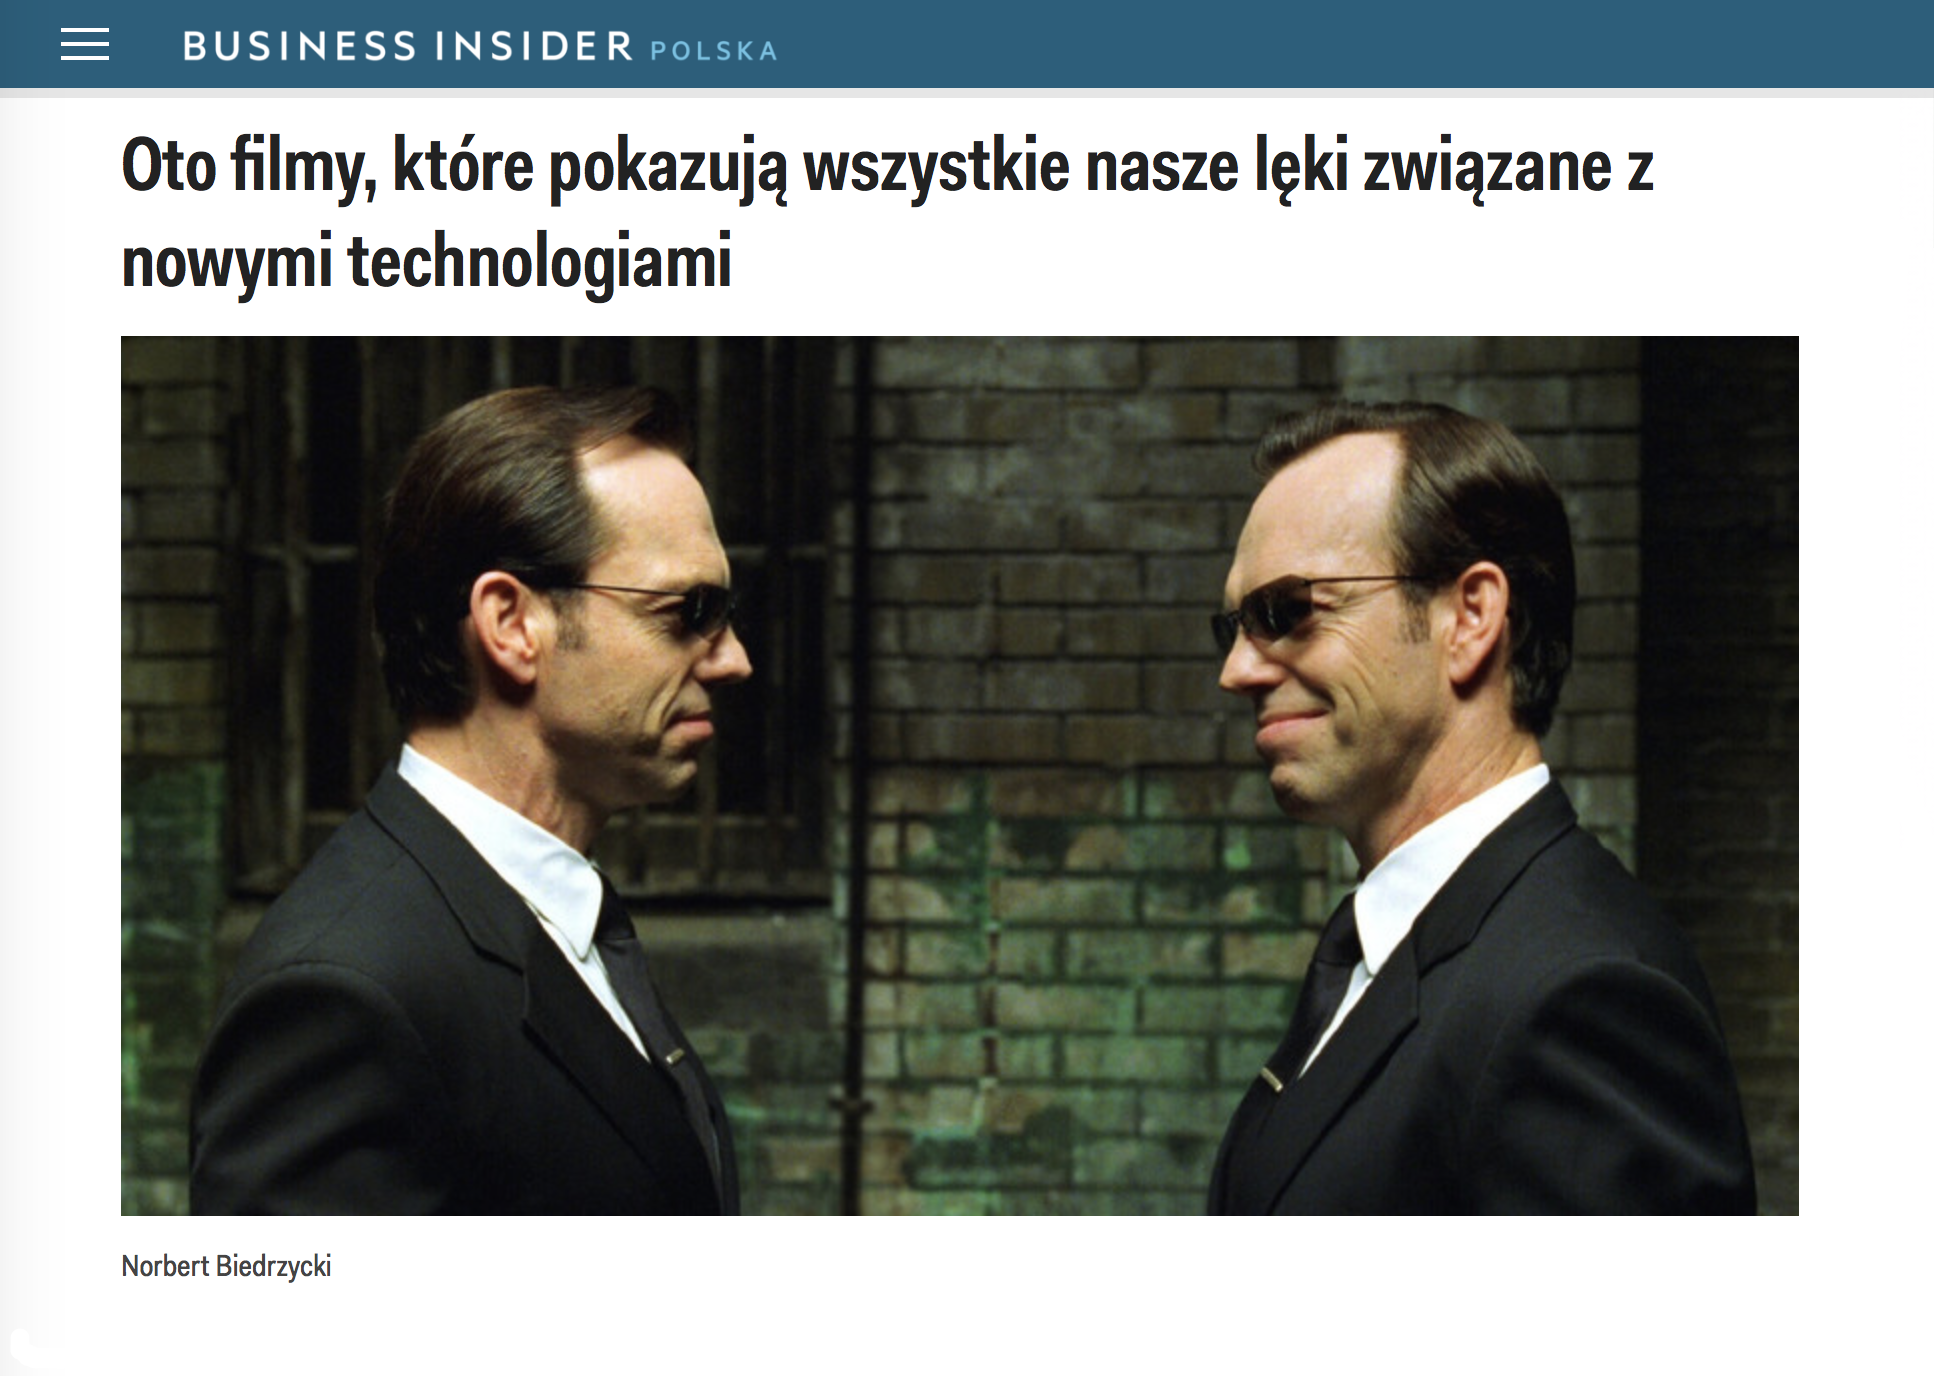 Norbert Biedrzycki Business Insider AI movies